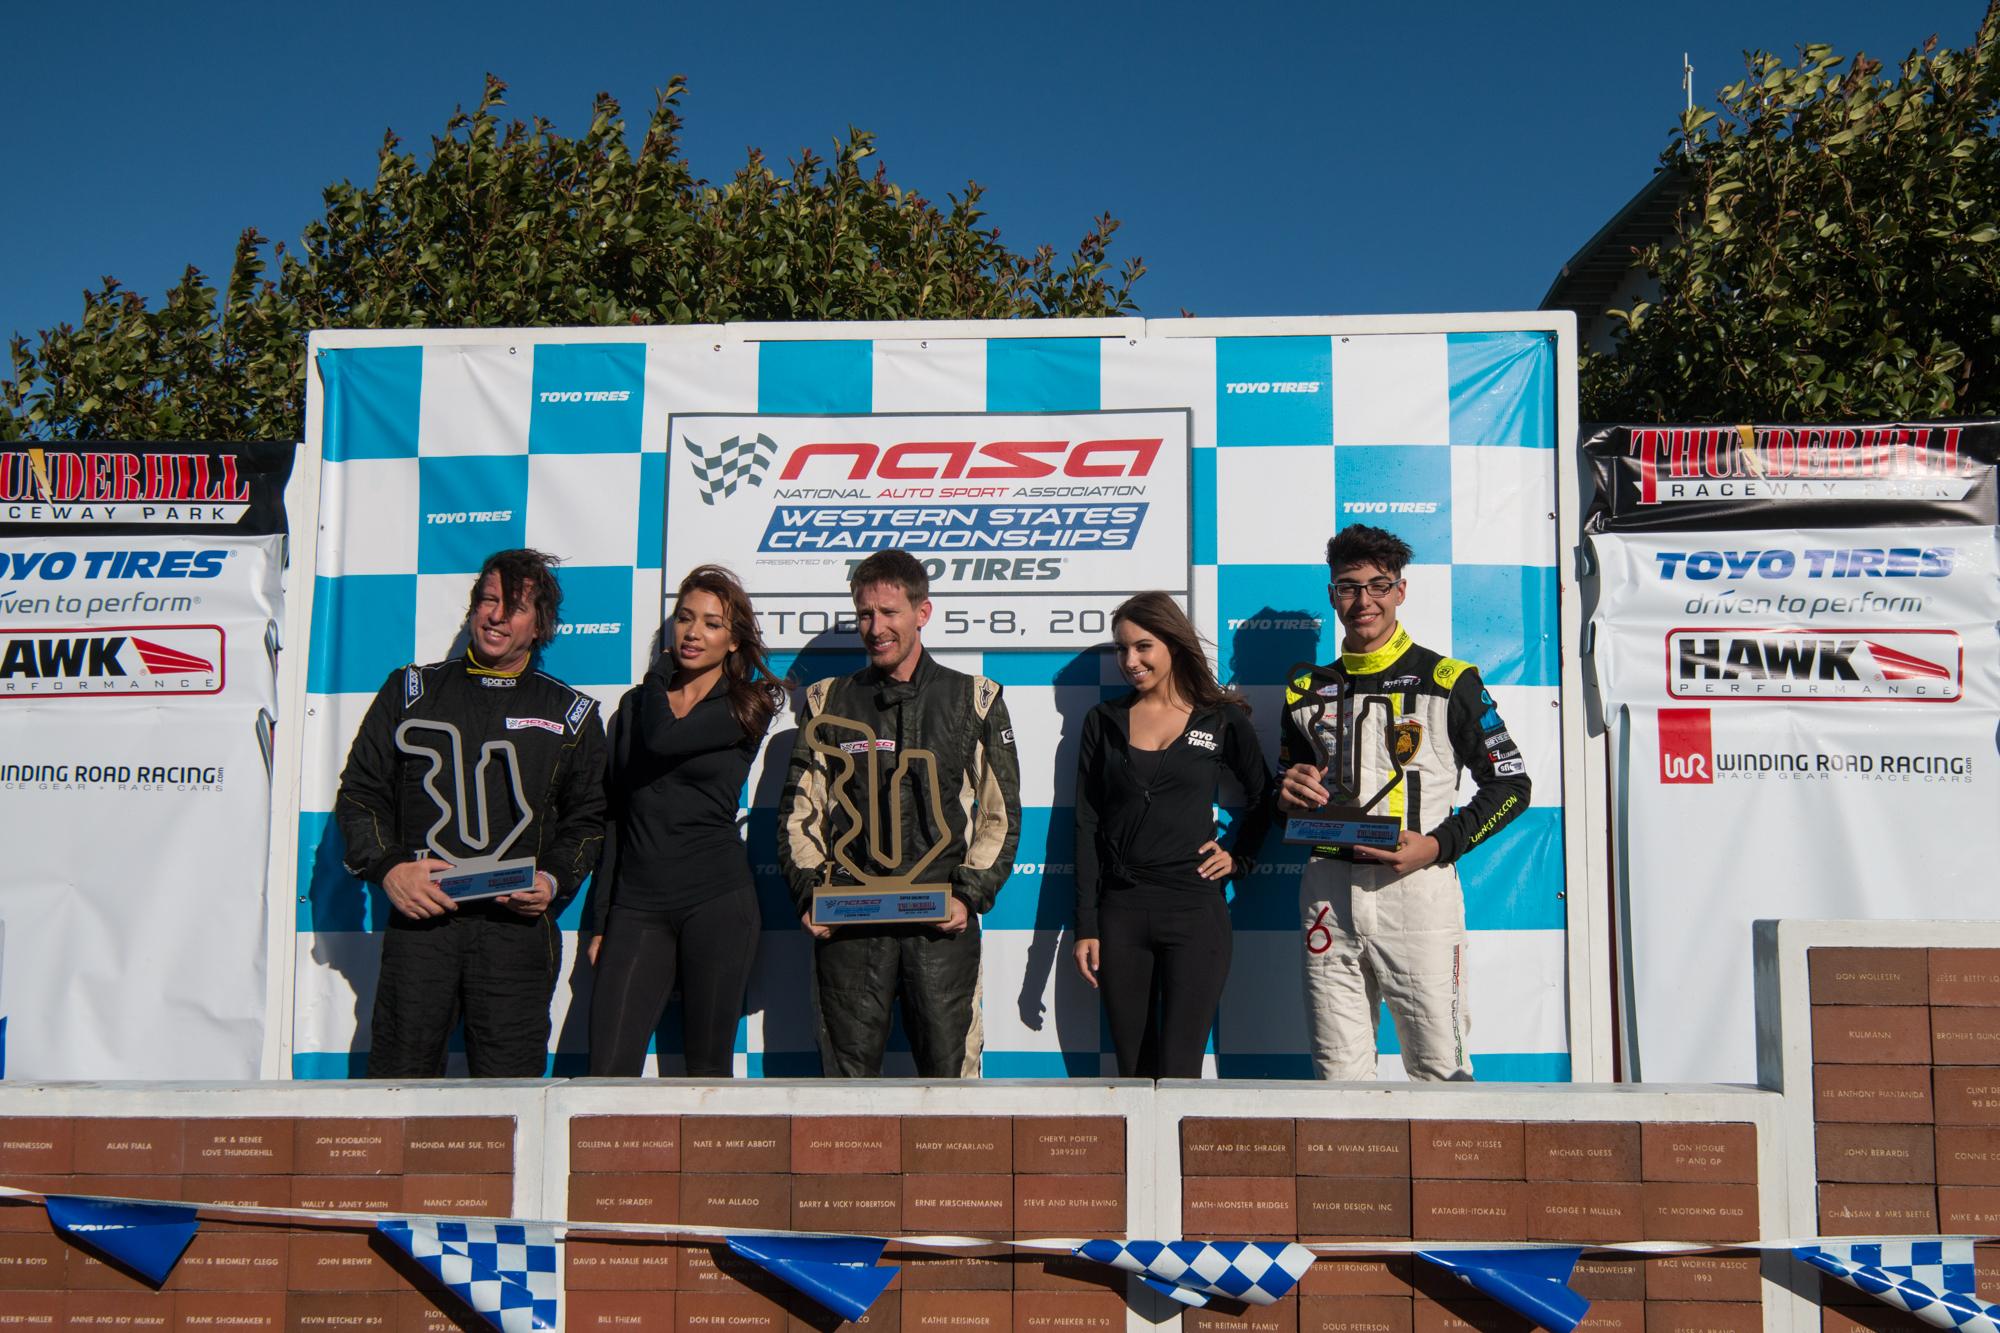 Steven-Racing-20130208-45919.jpg